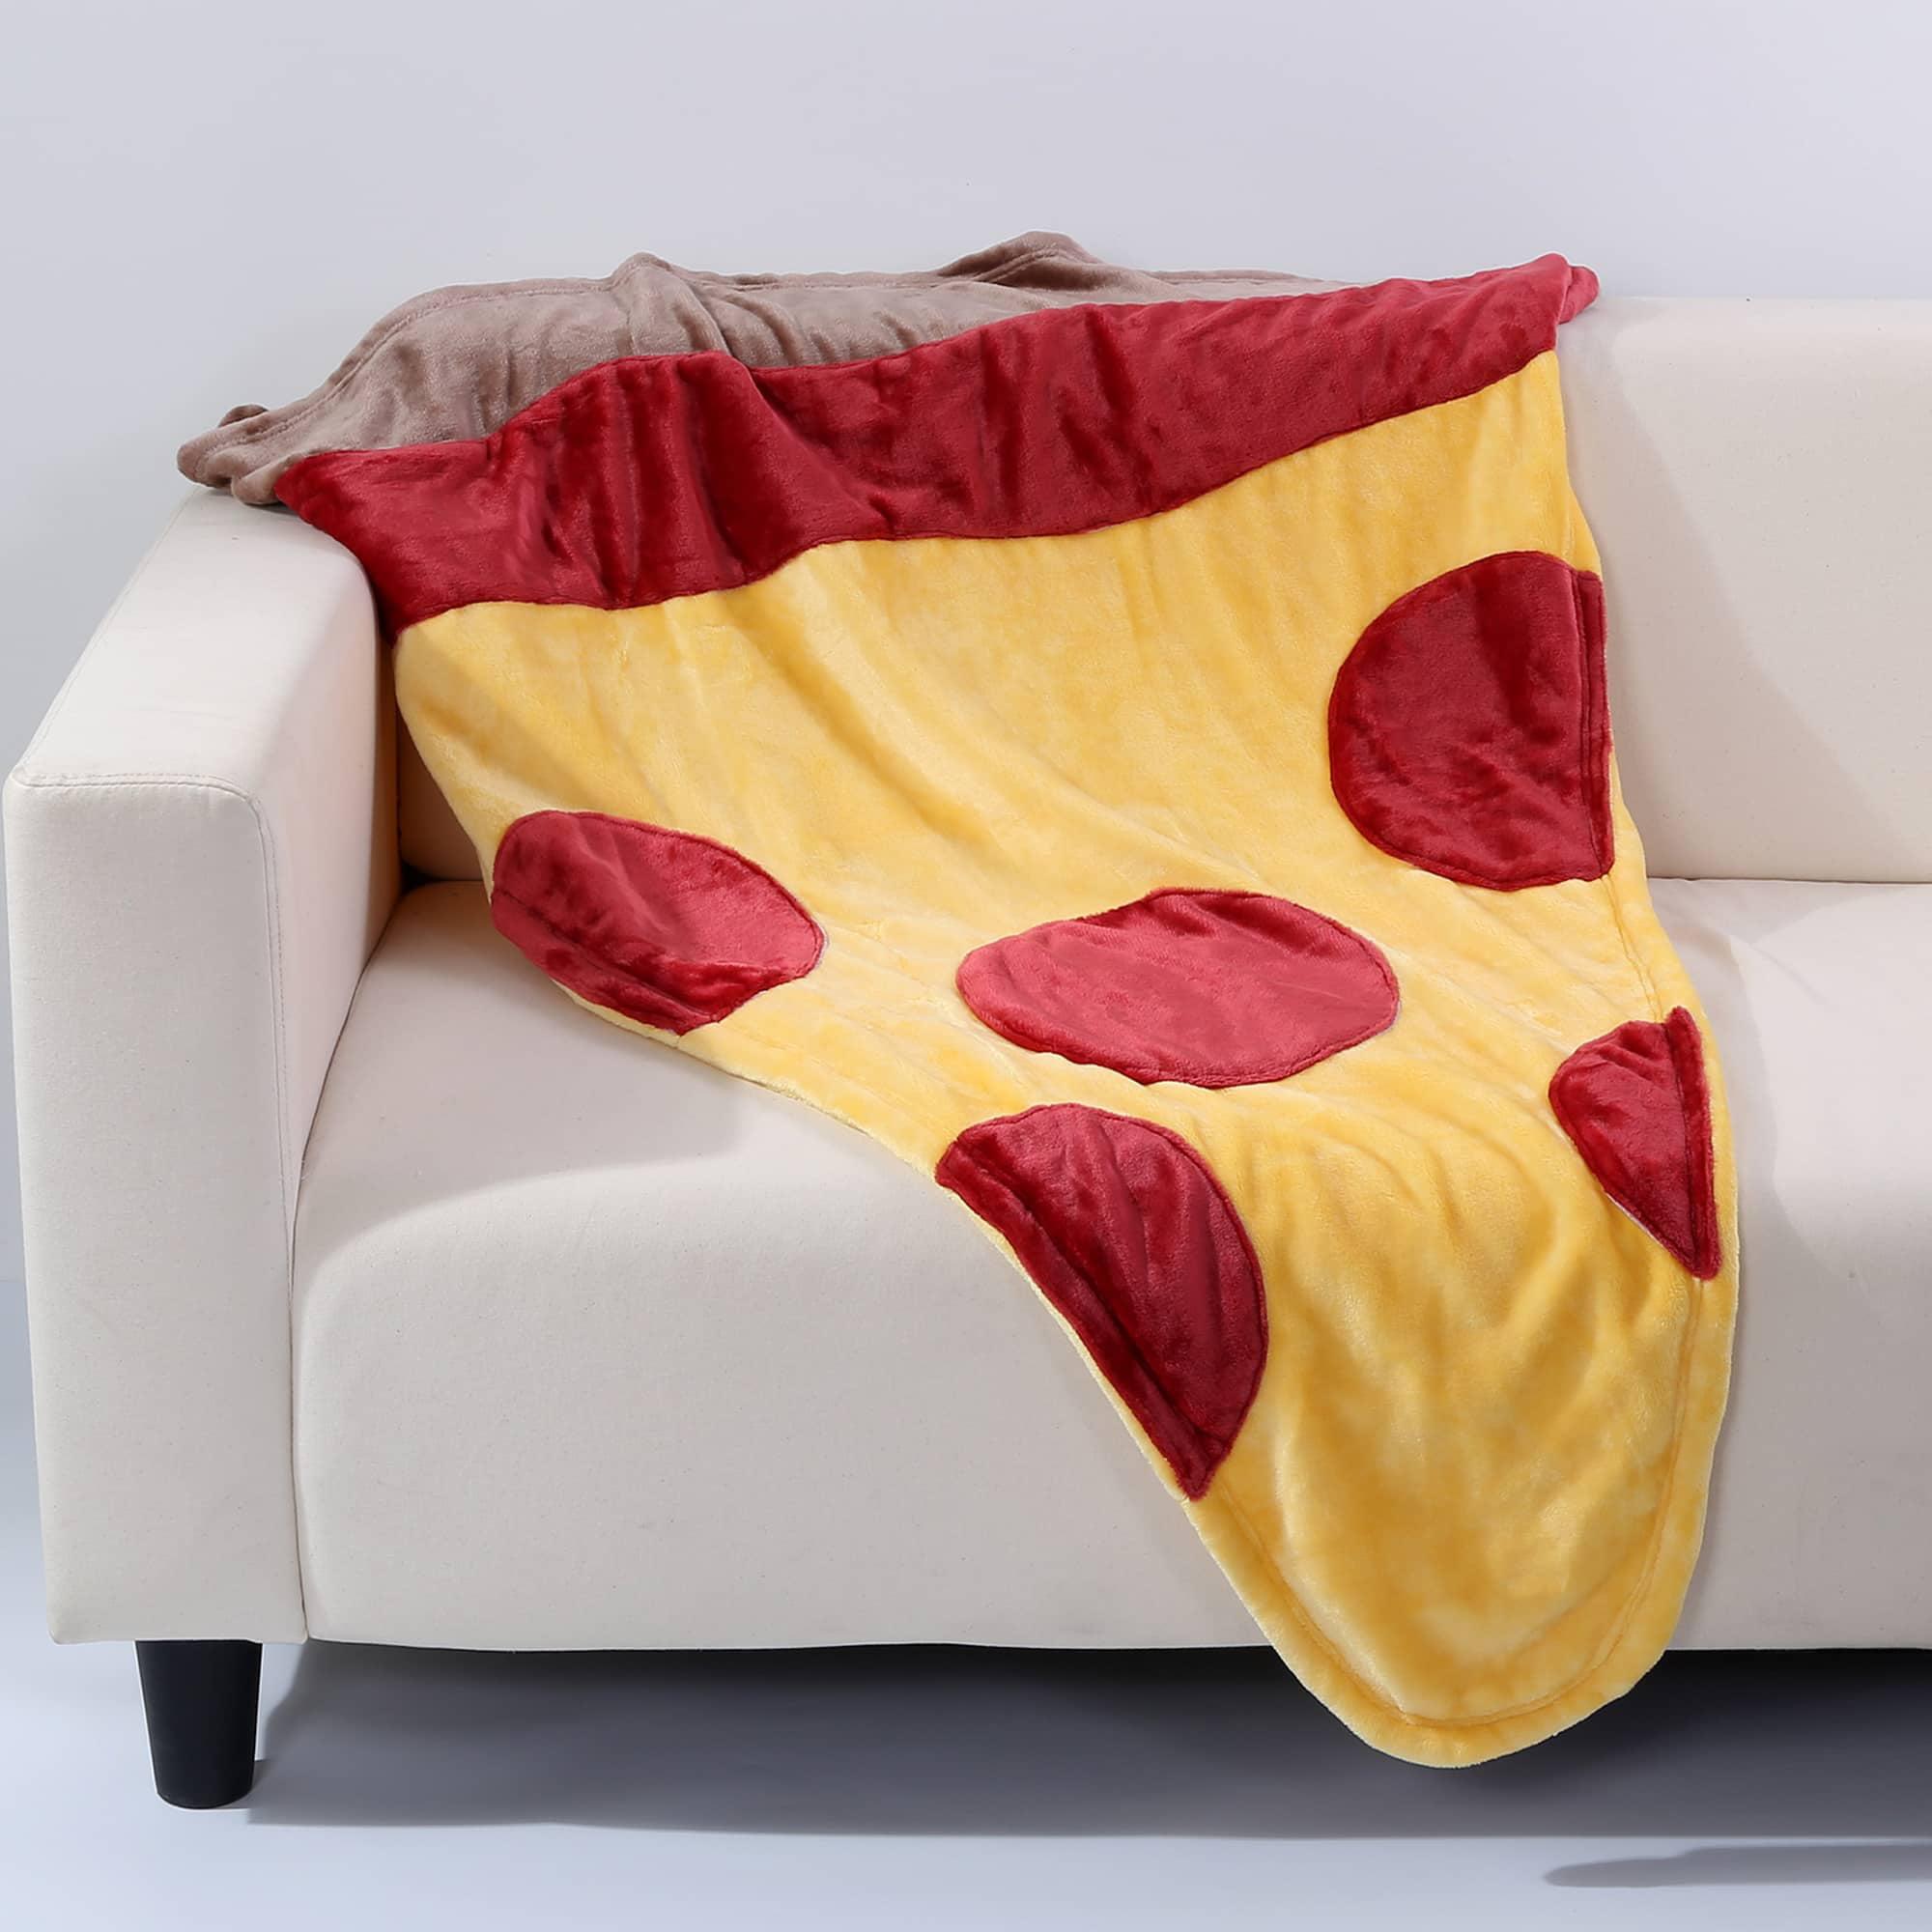 Berkshire Blanket and Home Co Berkshire Blanket Cuddly Buddies Pizza Slice Footie Throw